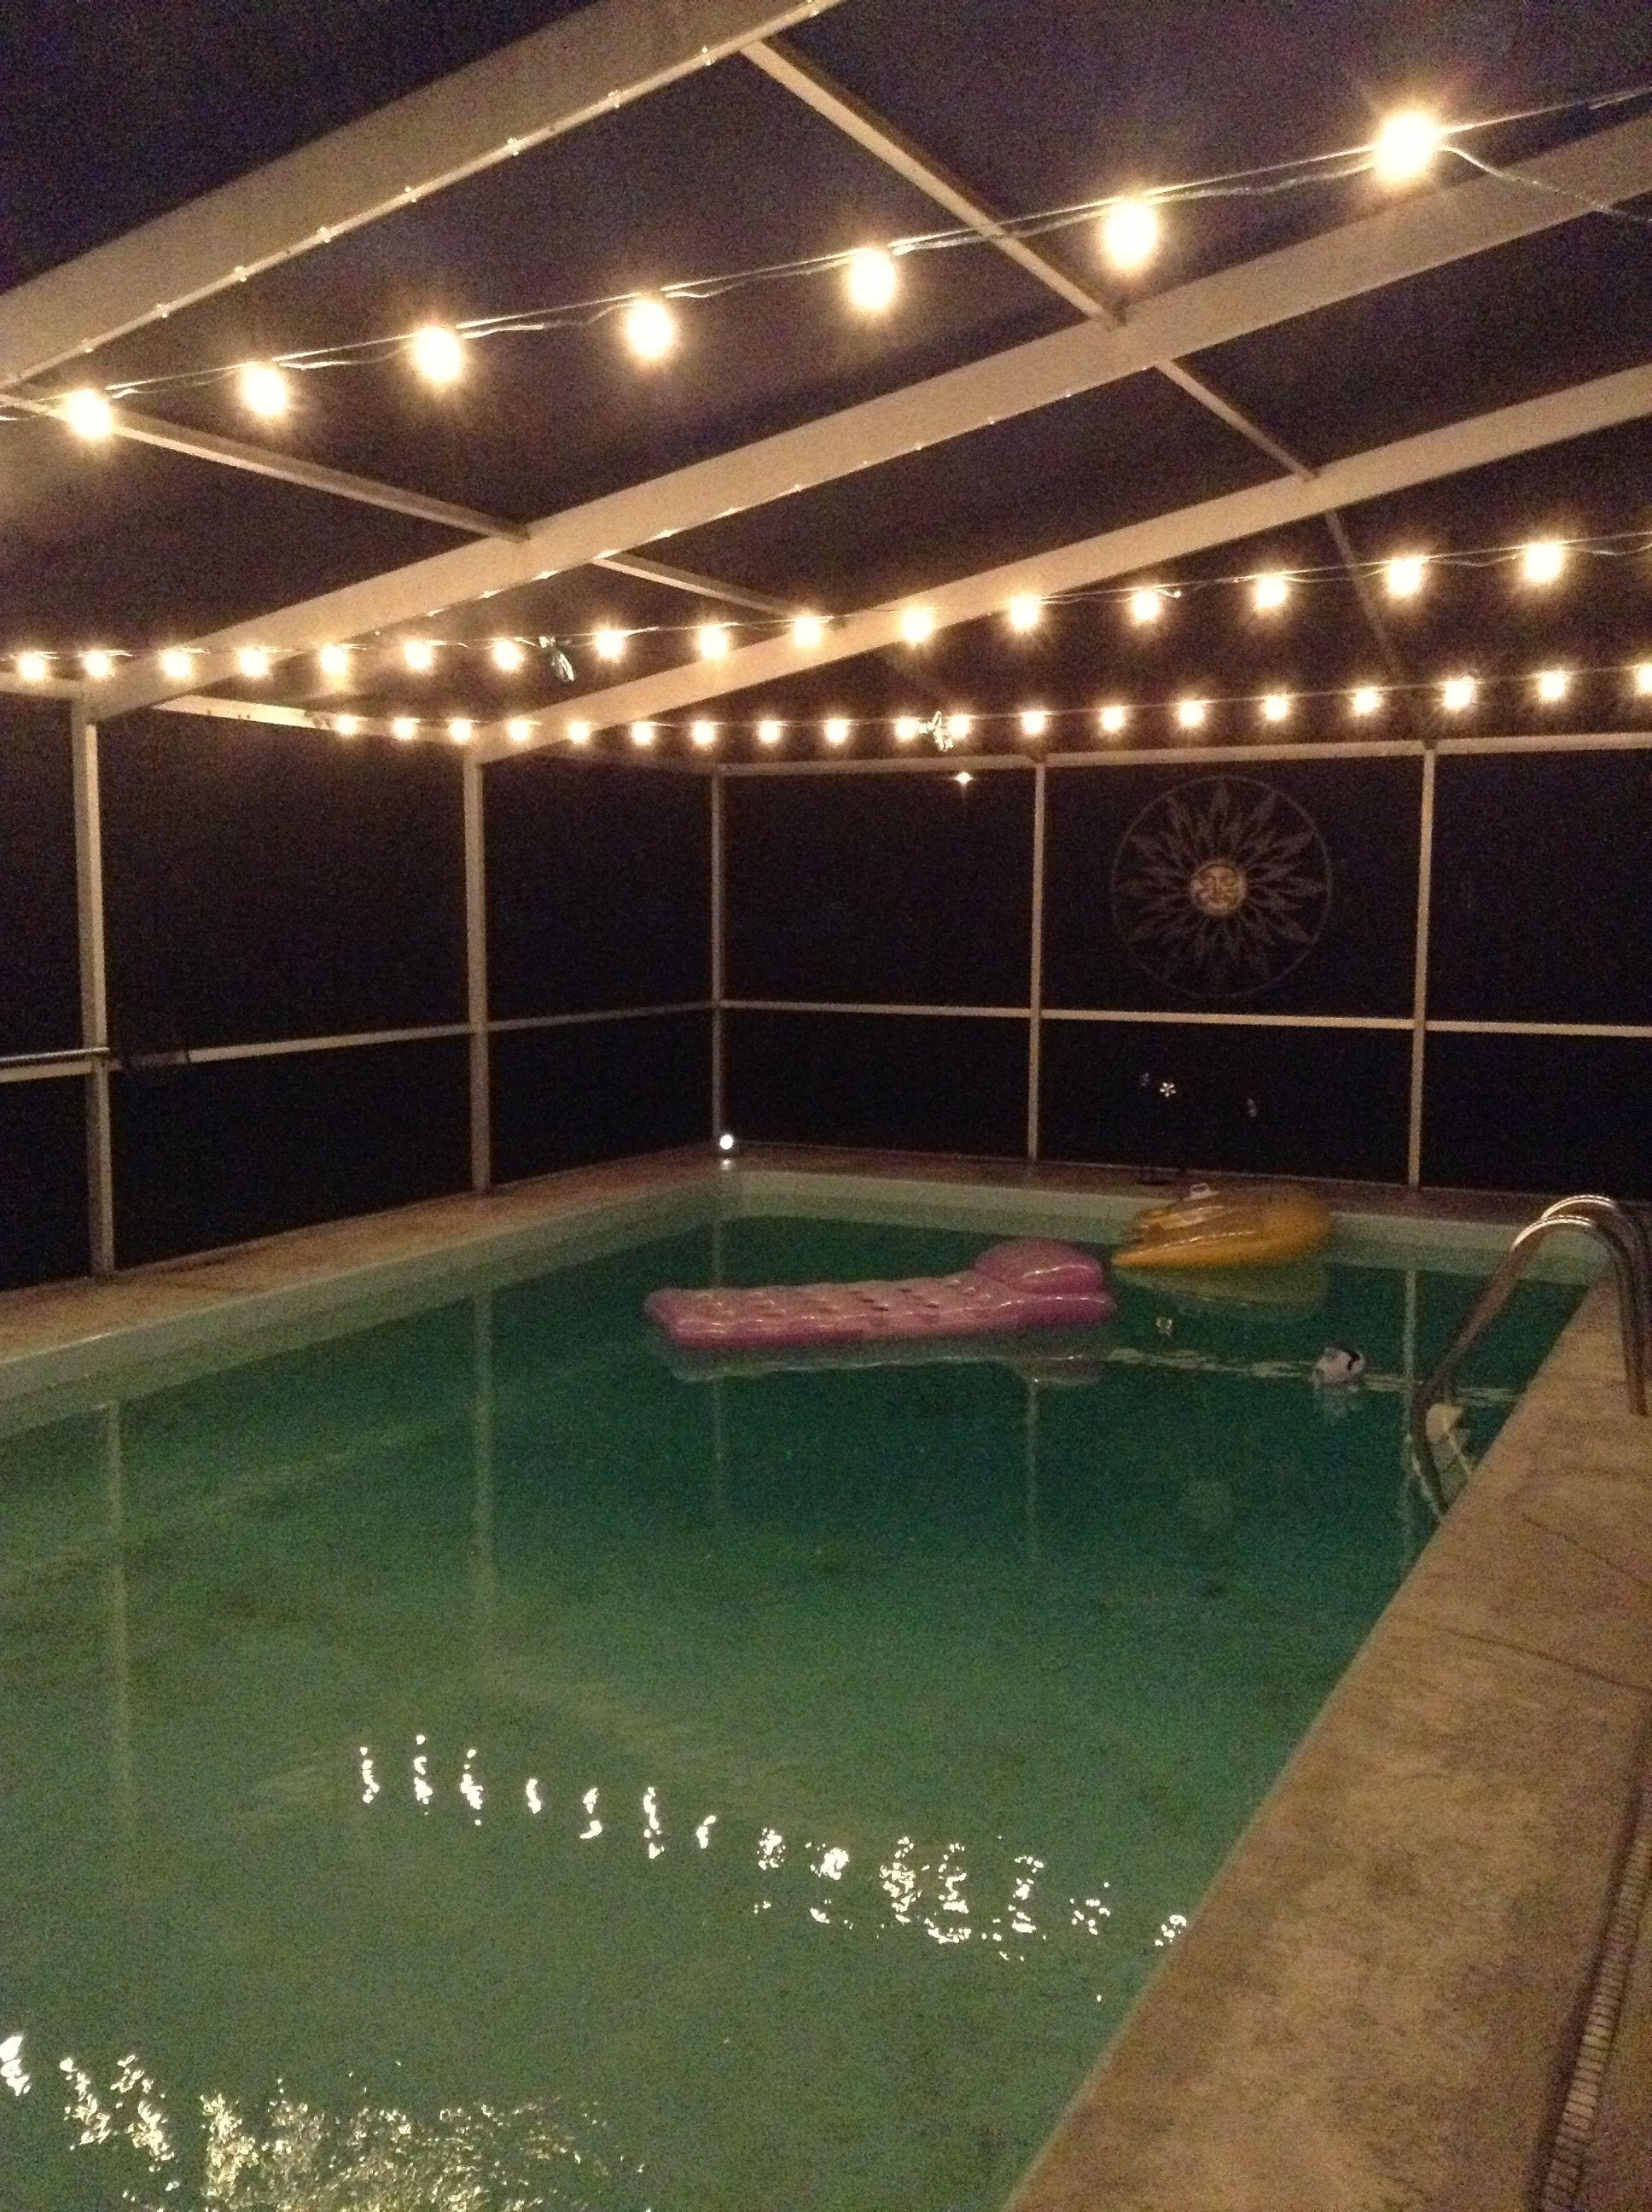 Pool Lights Screened Pool Pool Decor Pool Houses